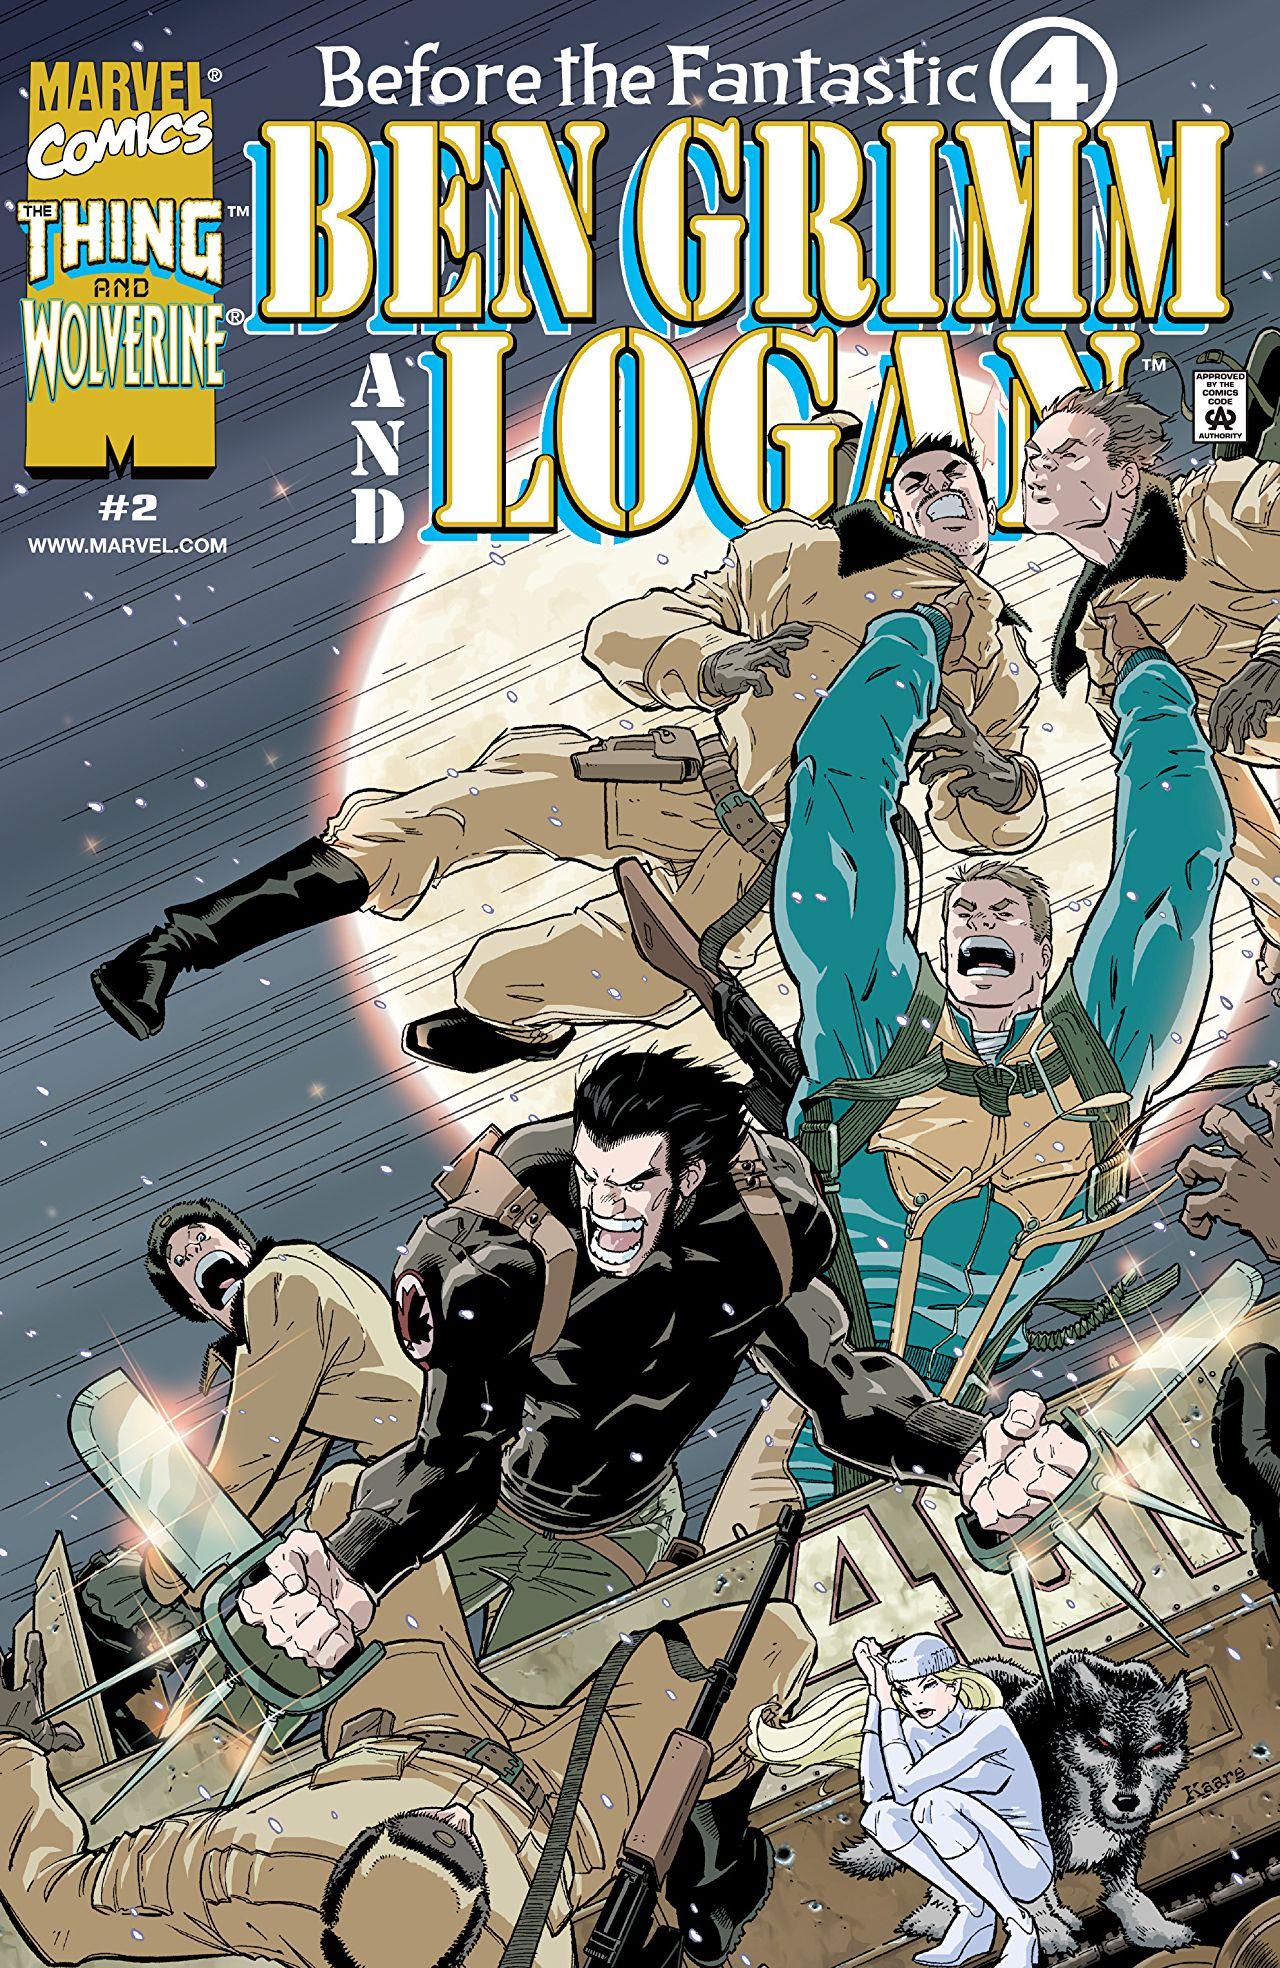 Before the Fantastic Four: Ben Grimm and Logan Vol 1 2